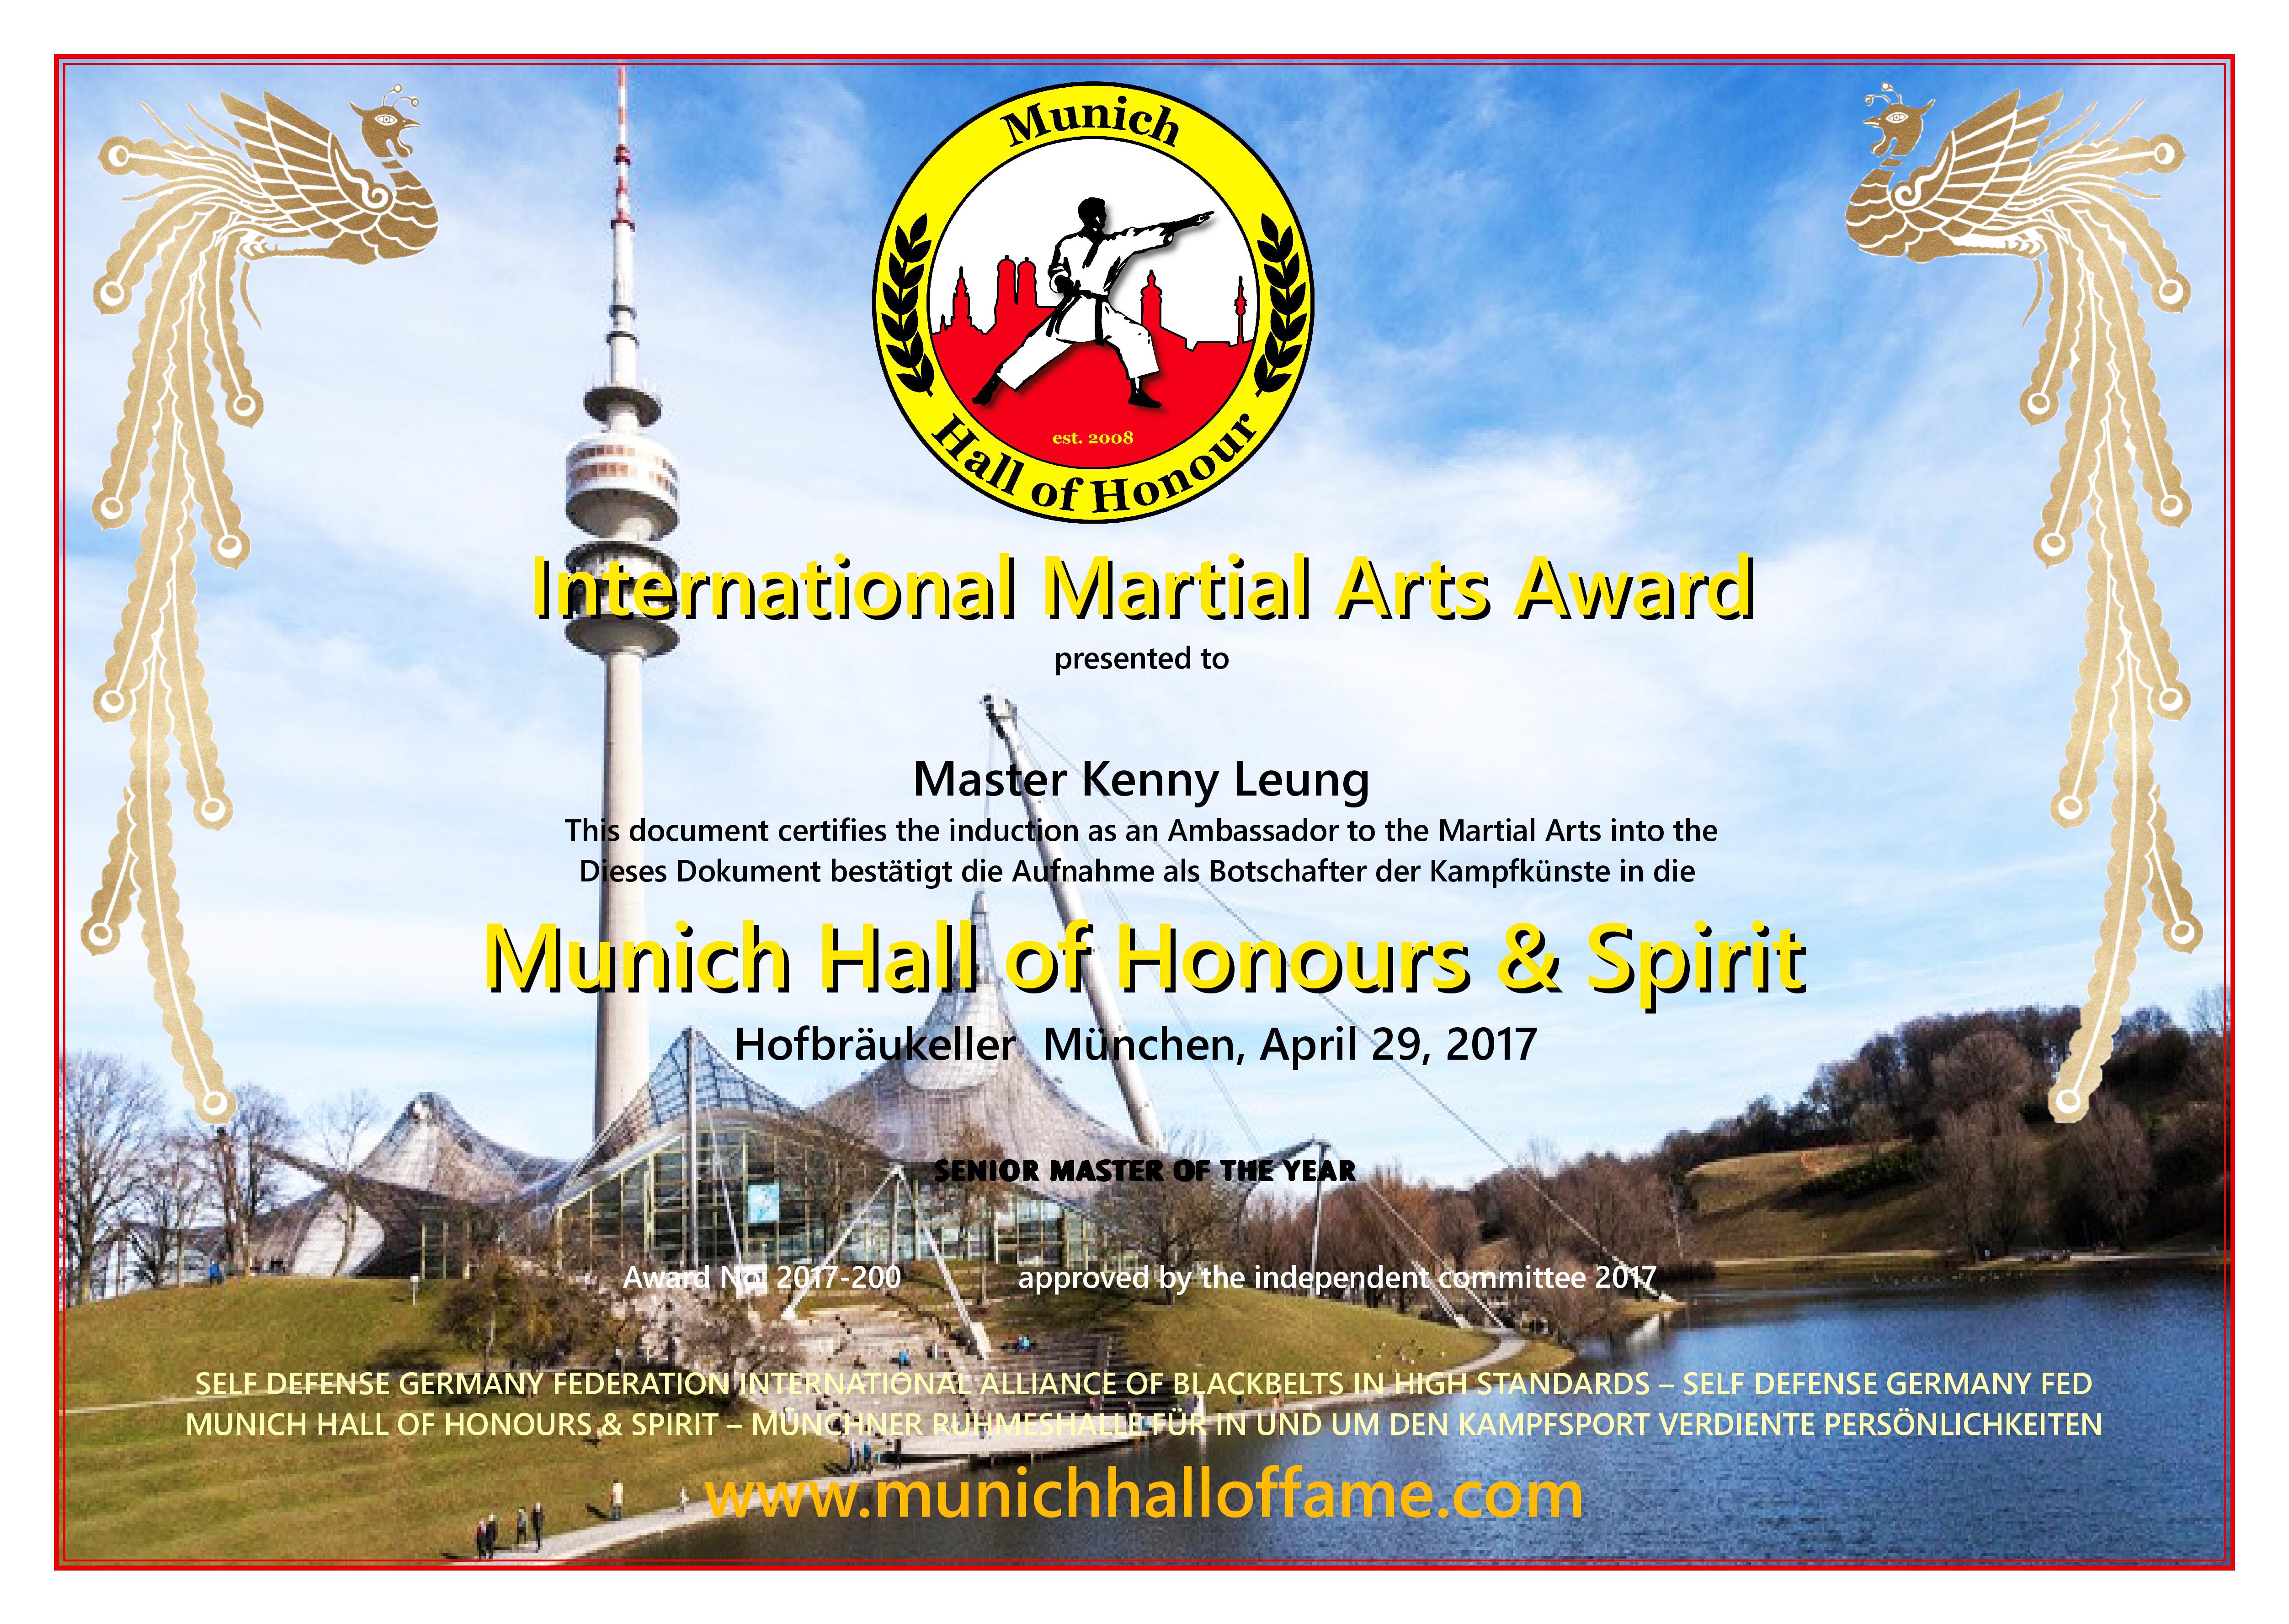 1.MUNICH HALL OF HONOURS~A3. 42.4x30.09